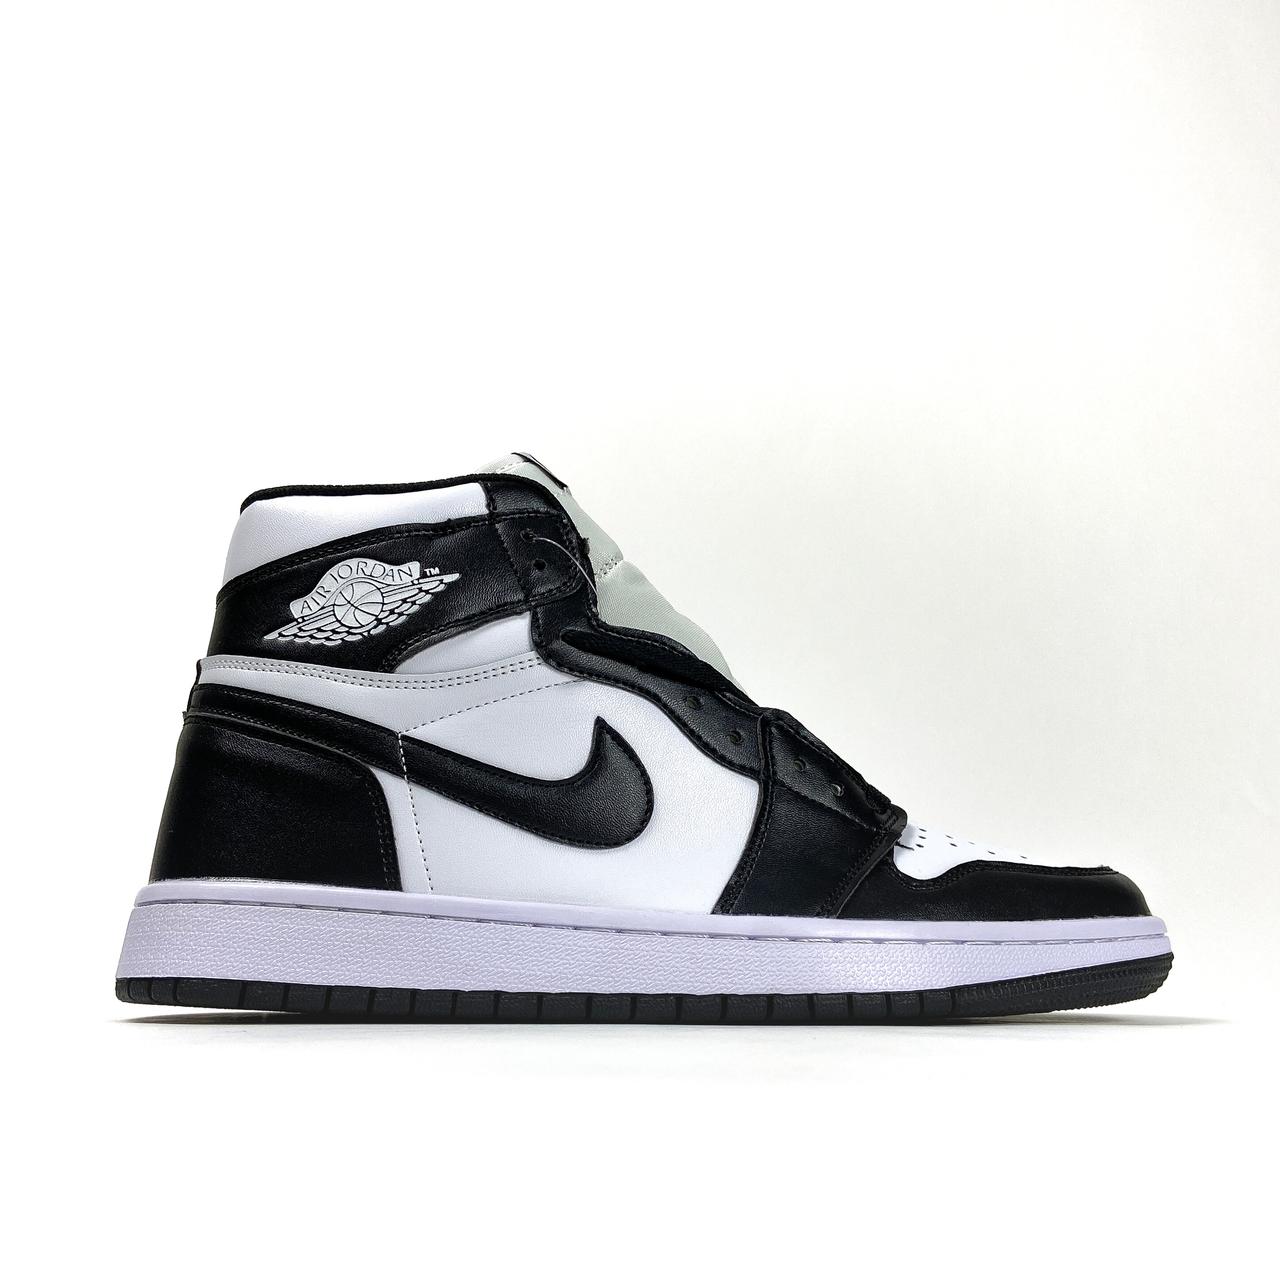 Nike Air Jordan 1 Black White (Білий)